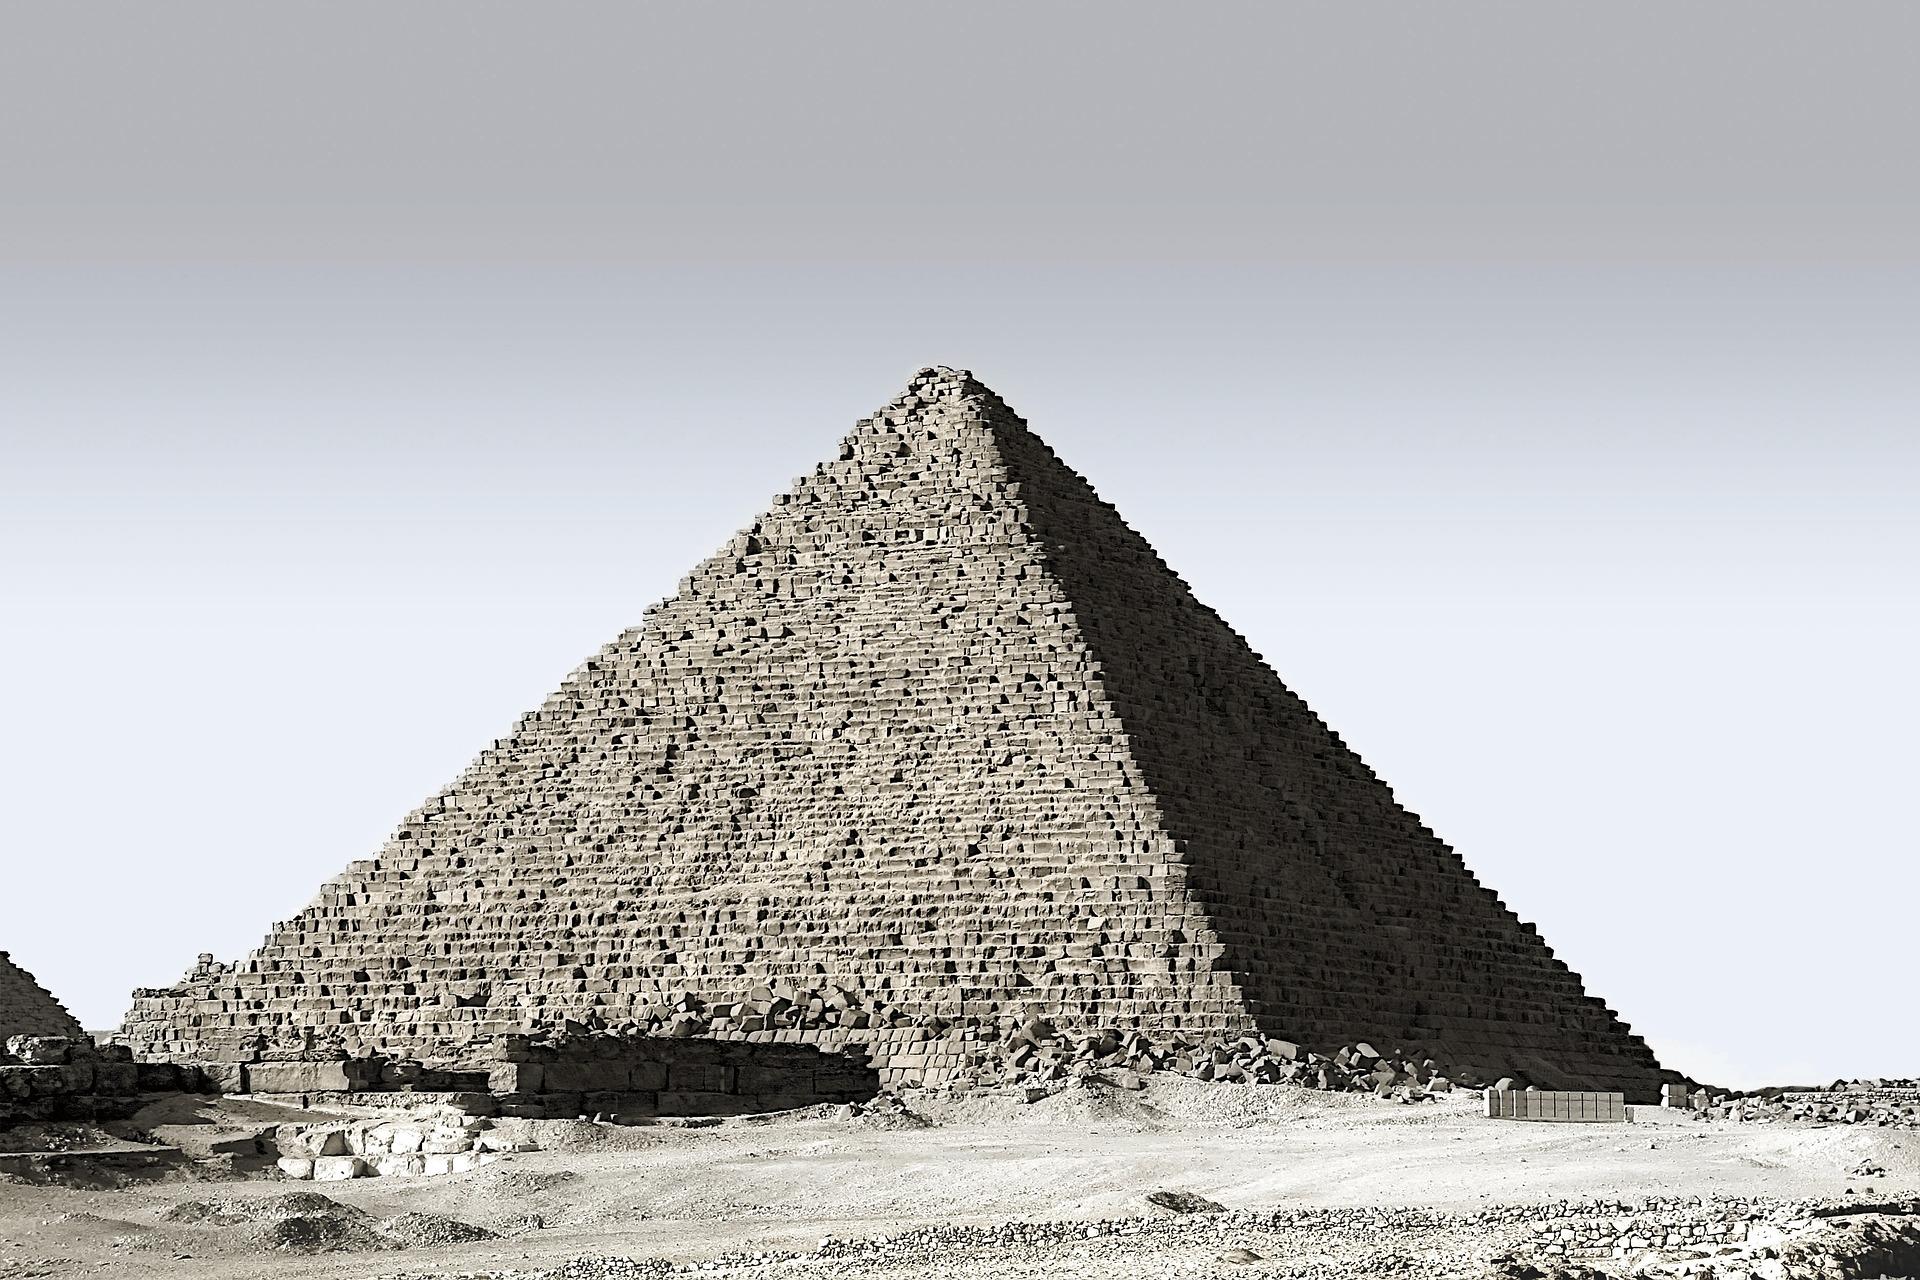 , Ägypten, Travelguide.at